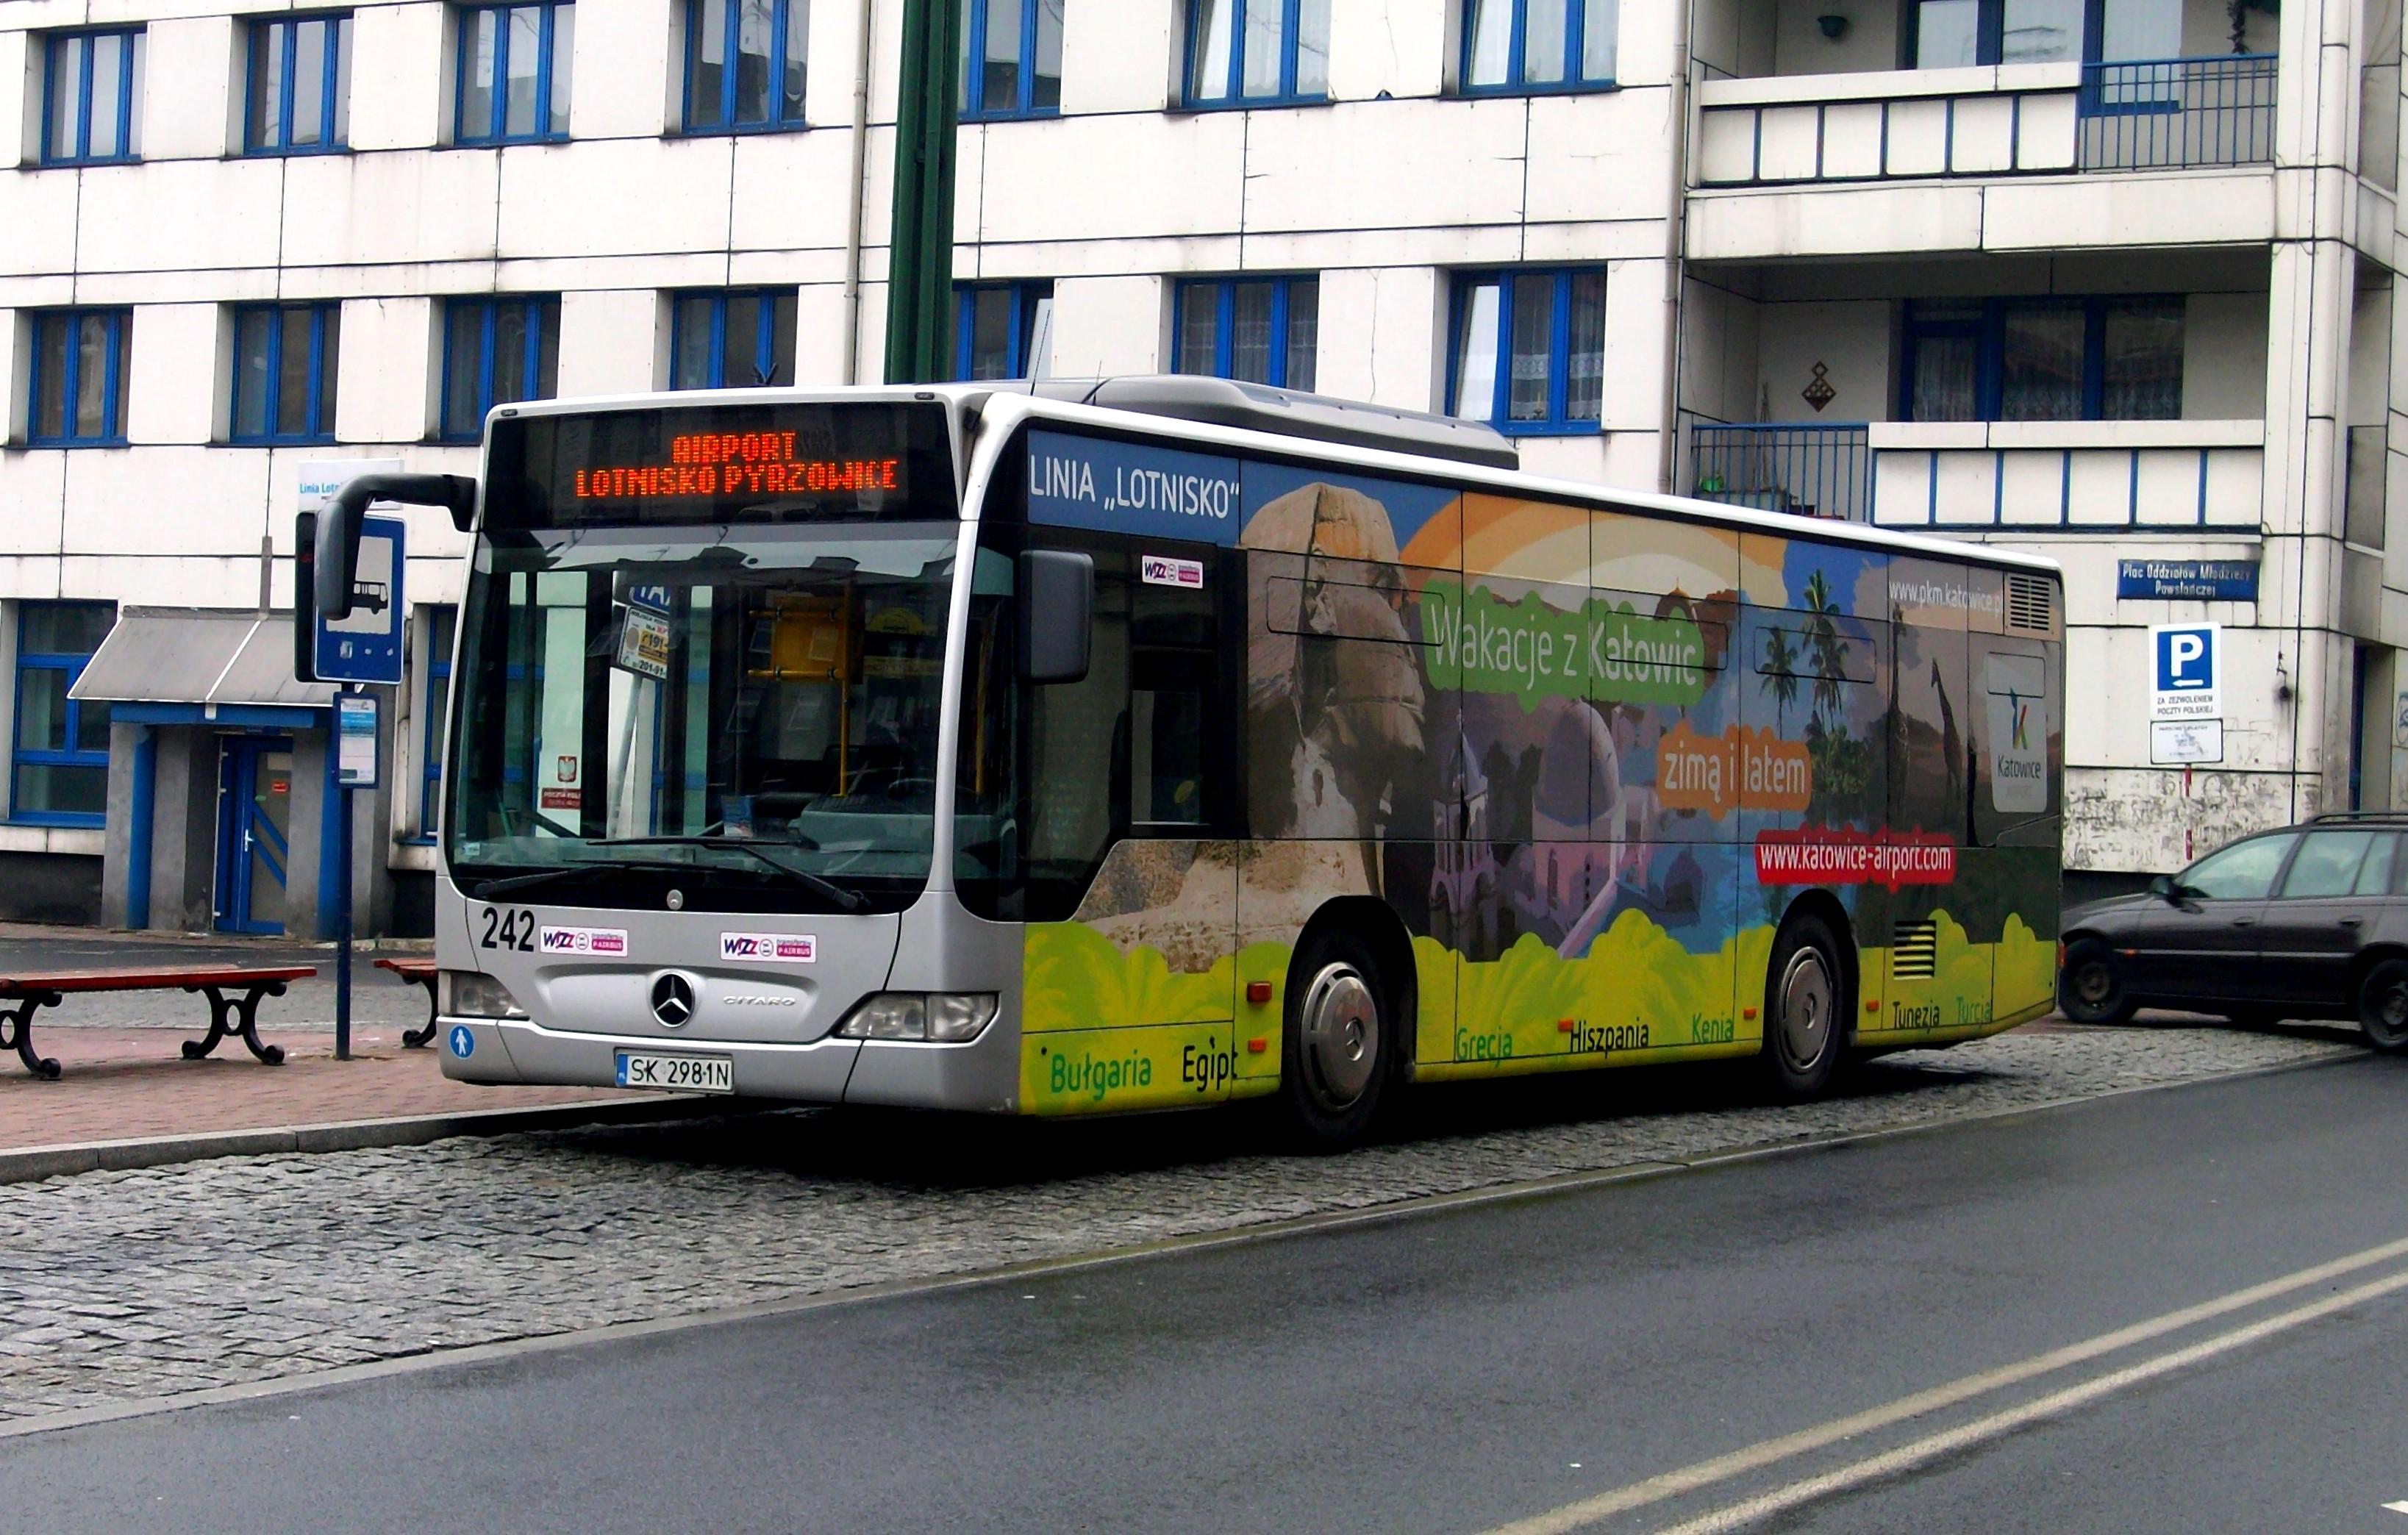 File:Mercedes-Benz Citaro Katowice n°242 Airport bus.JPG - Wikimedia ...